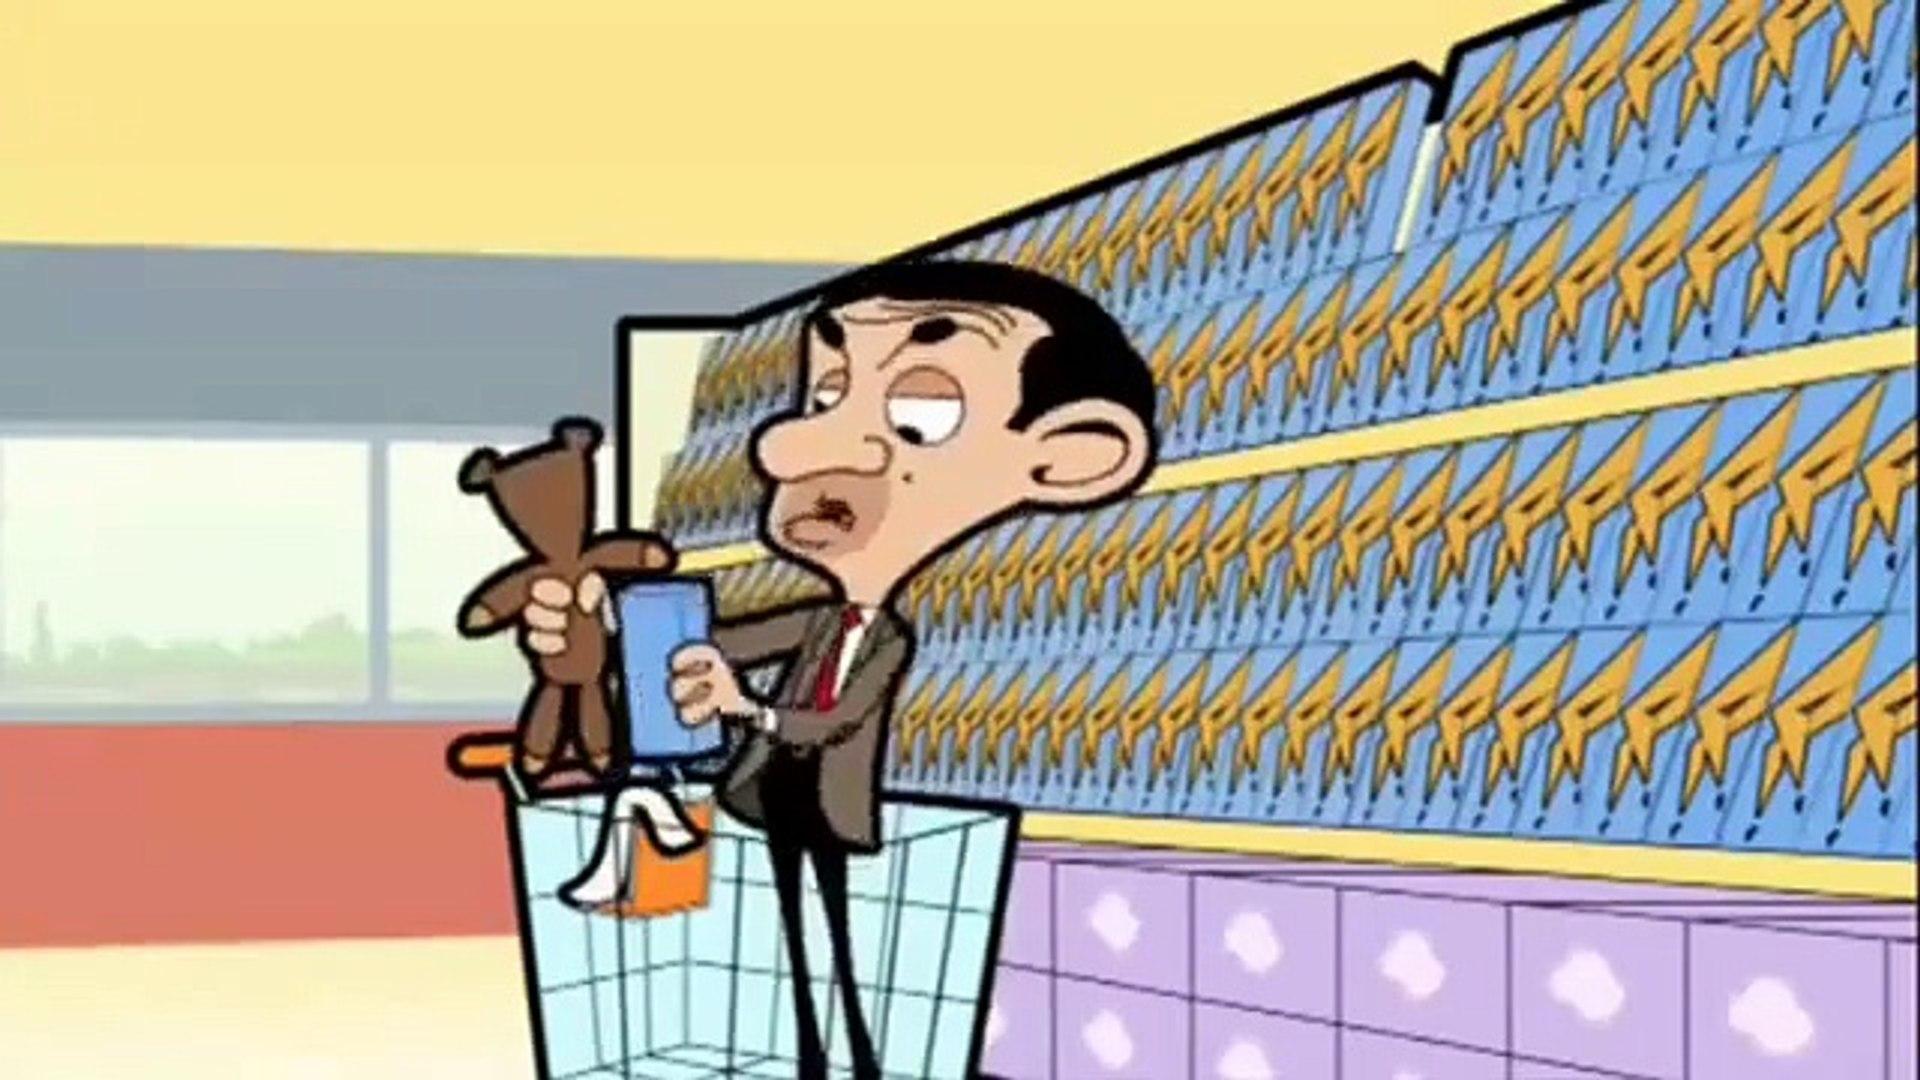 Mr Bean Cartoon•Hollywood Movies Full Movies•New Movies 2014•Animation Comedy Movies